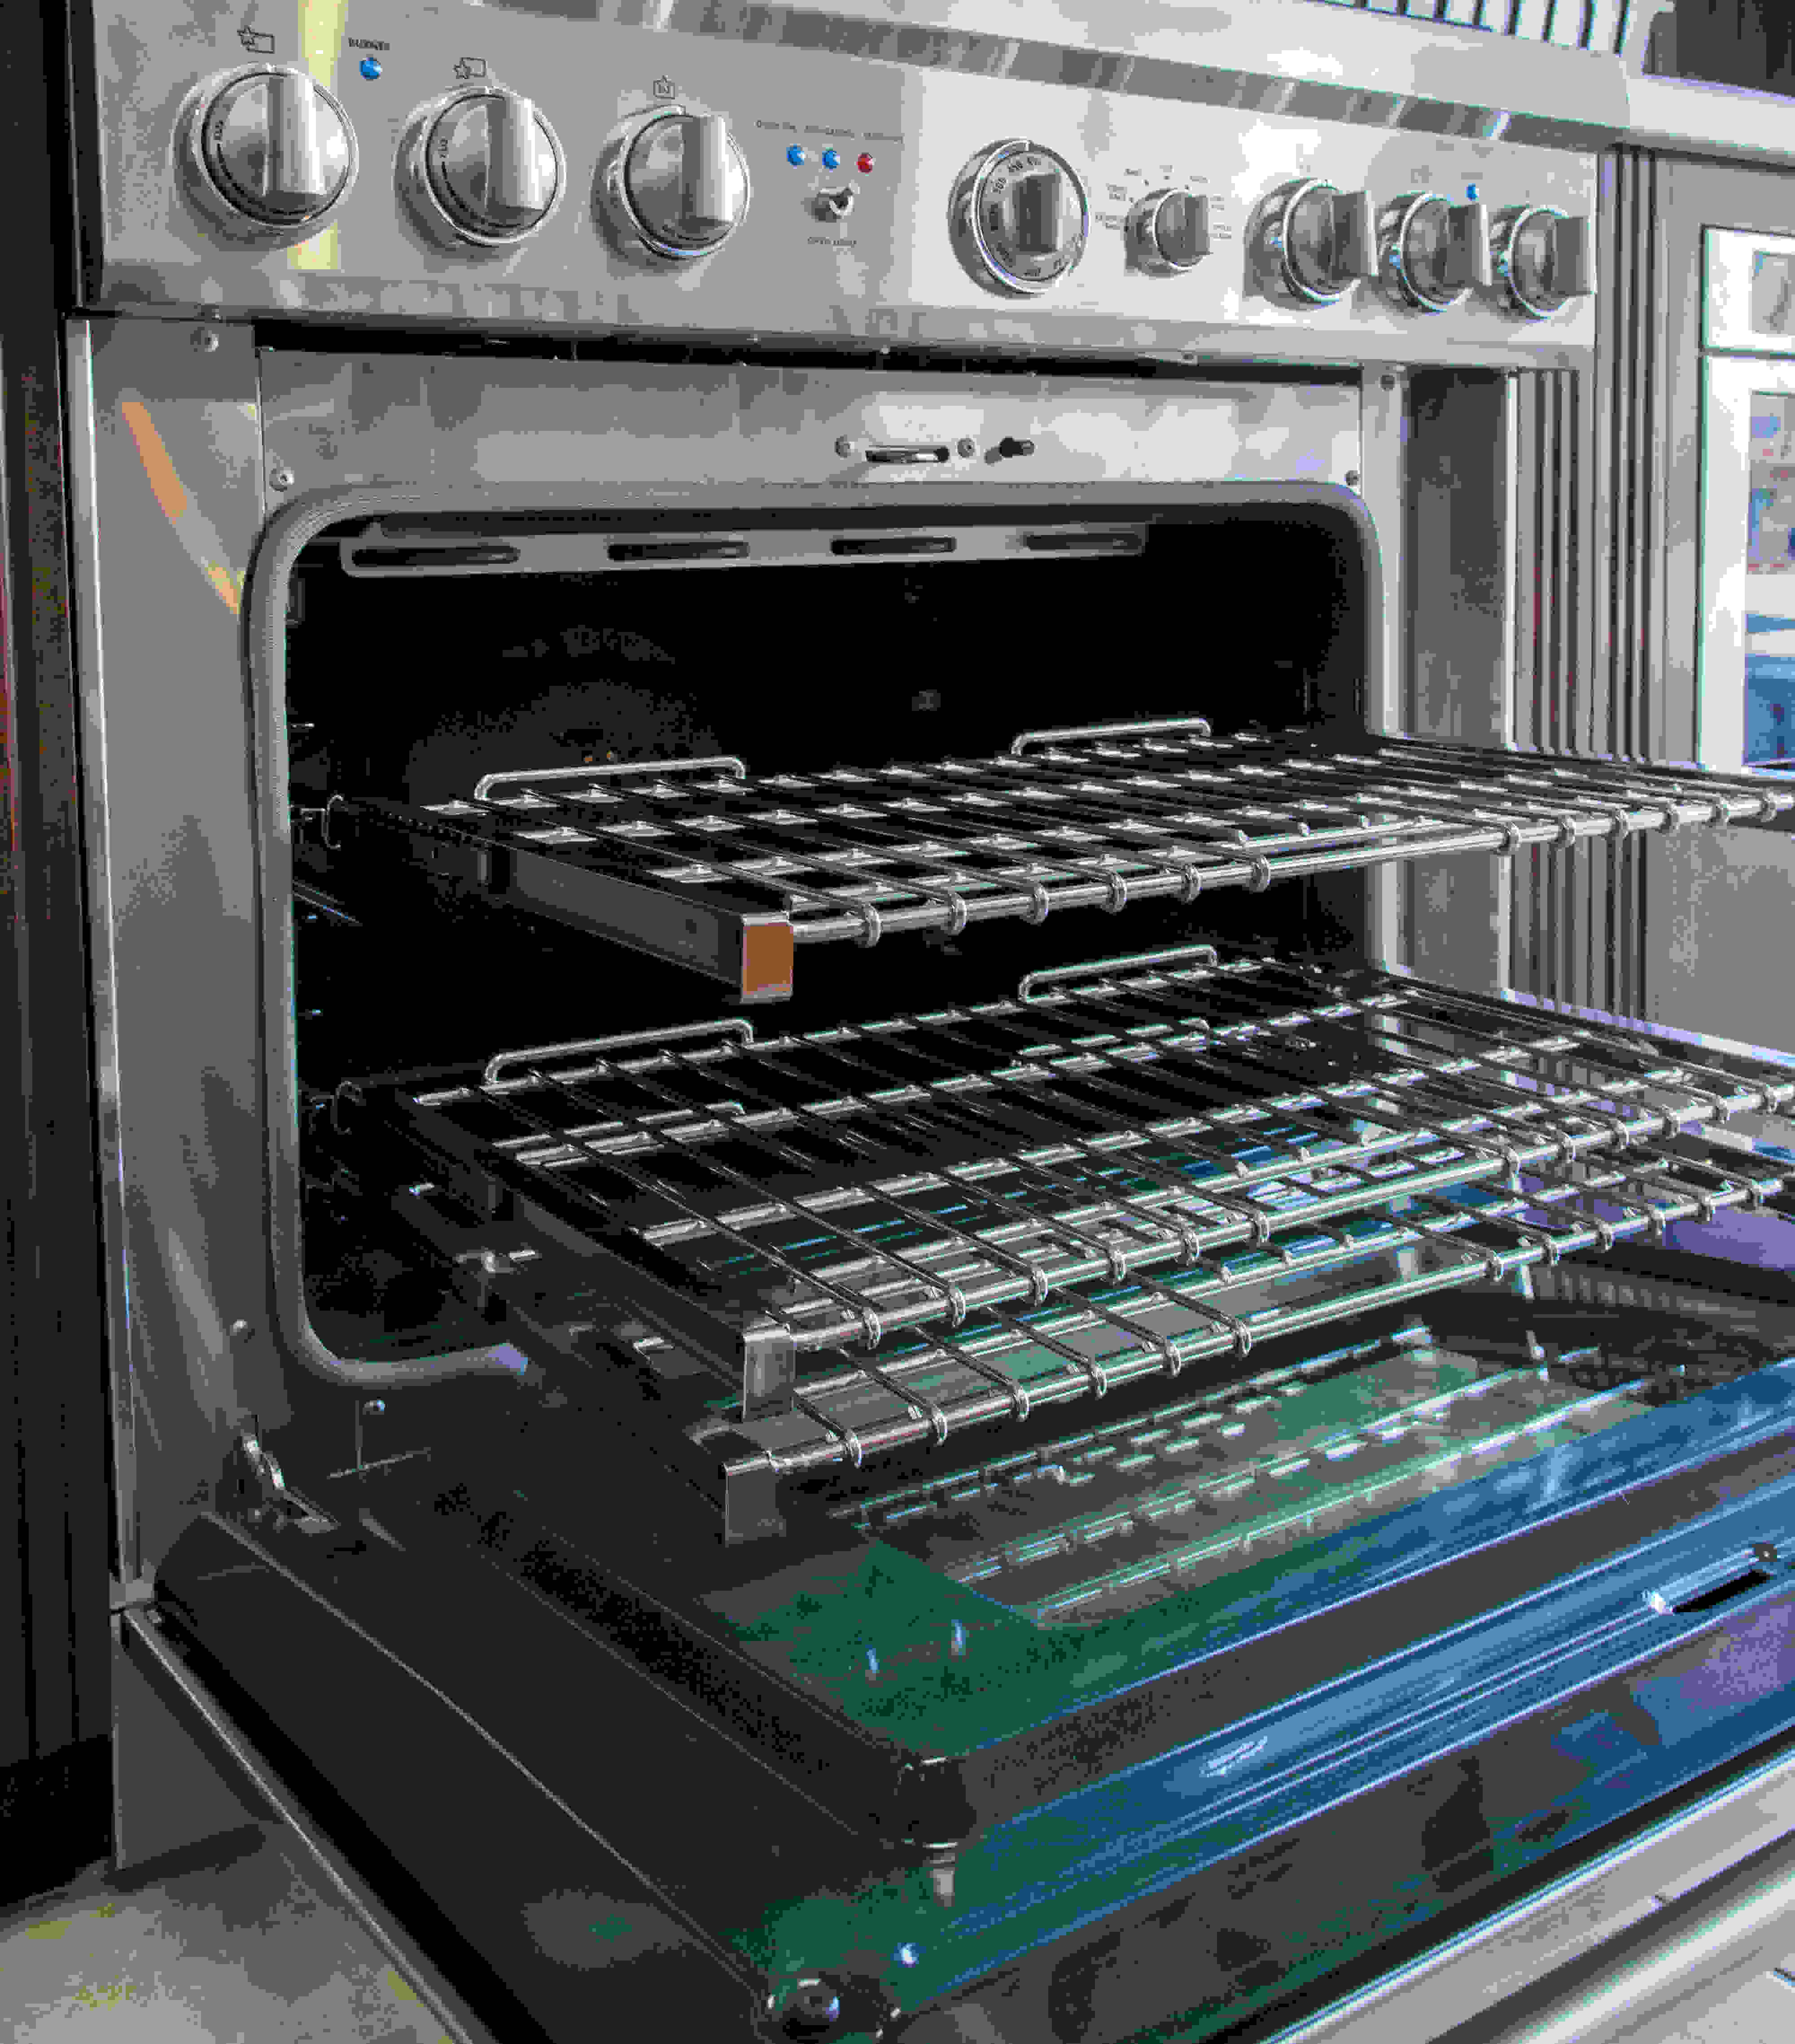 Oven with racks